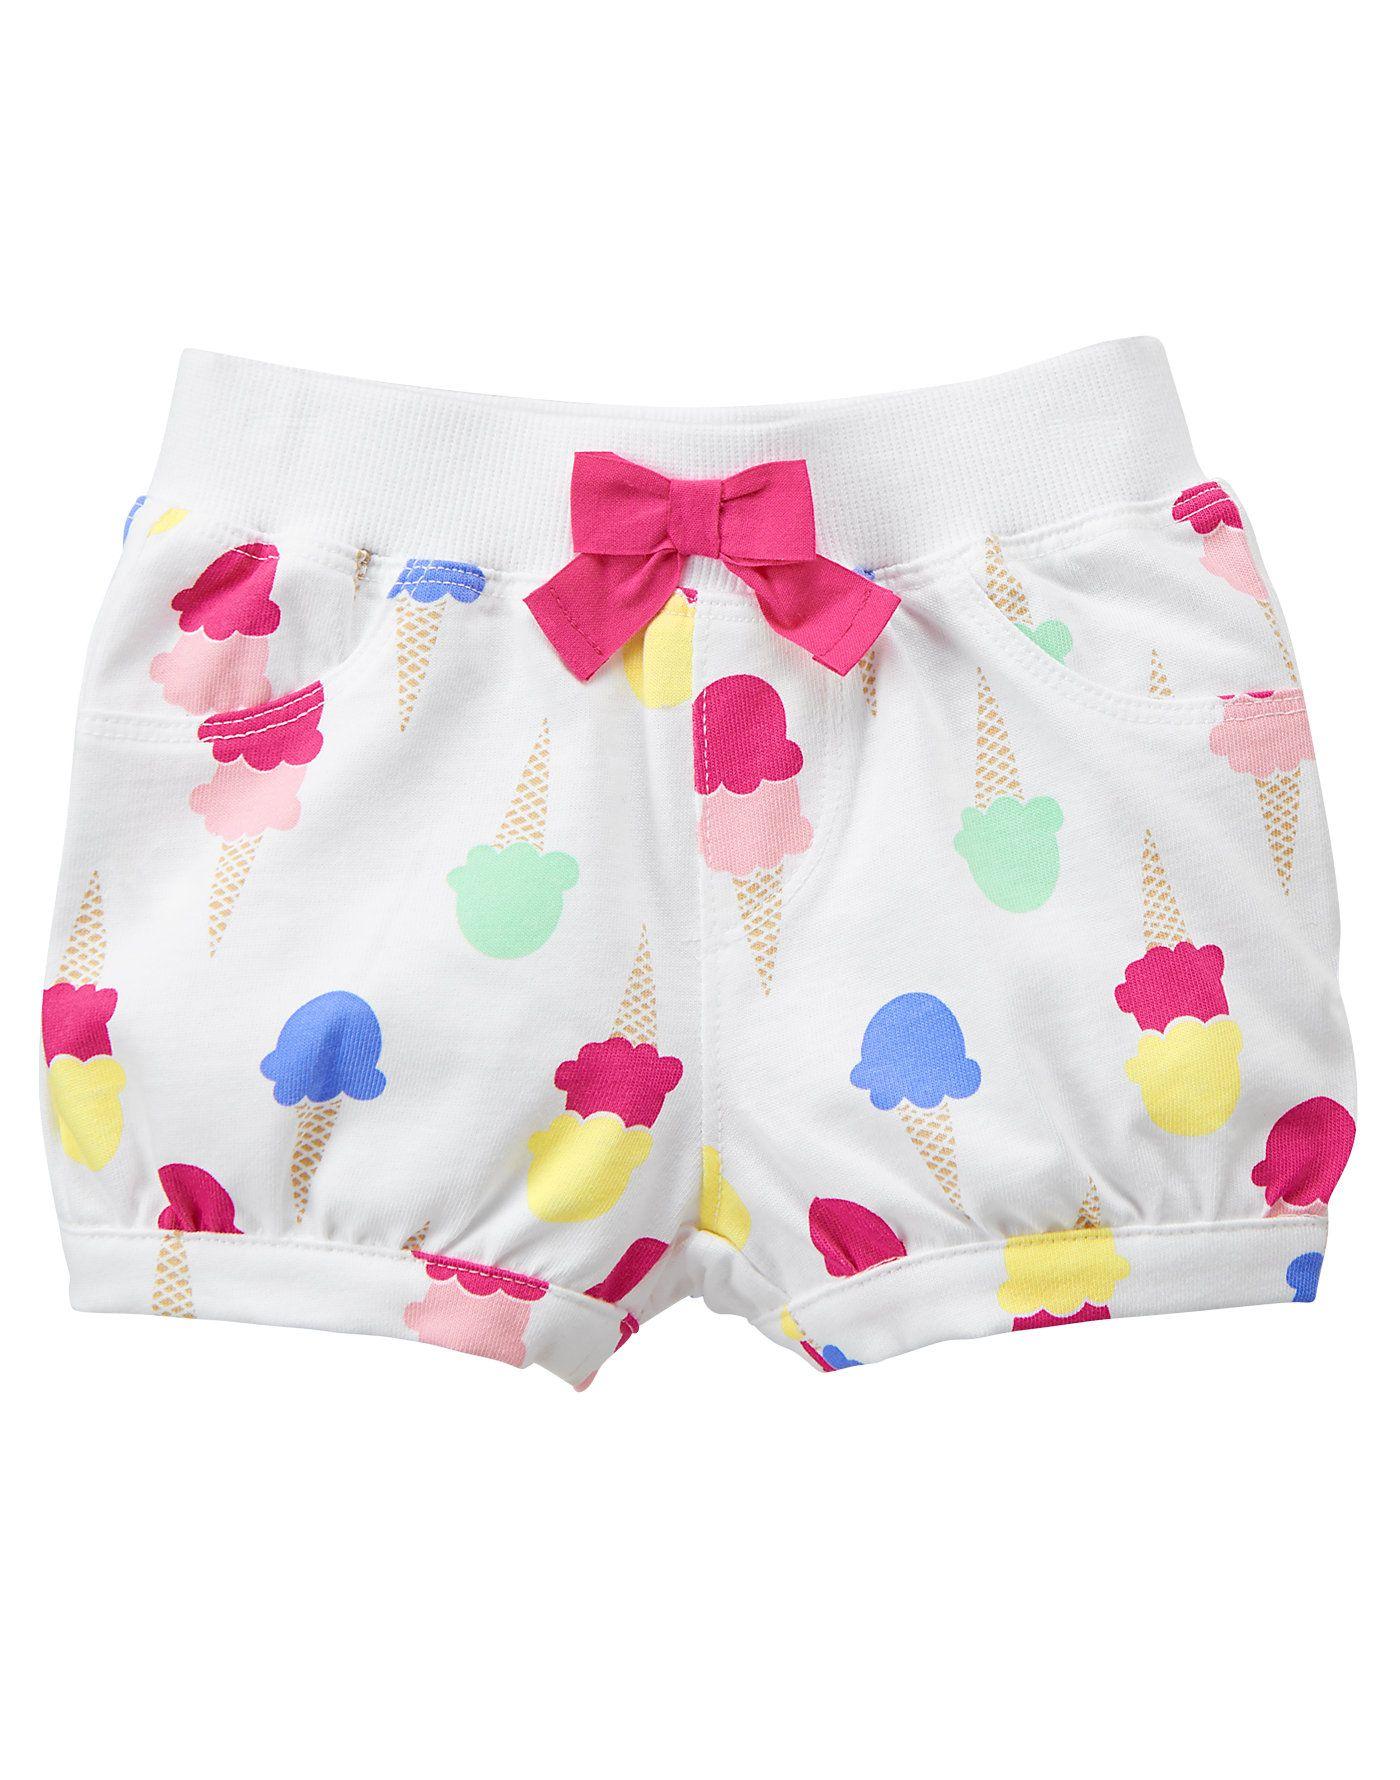 992b945dc6c0 Knit Bubble Shorts